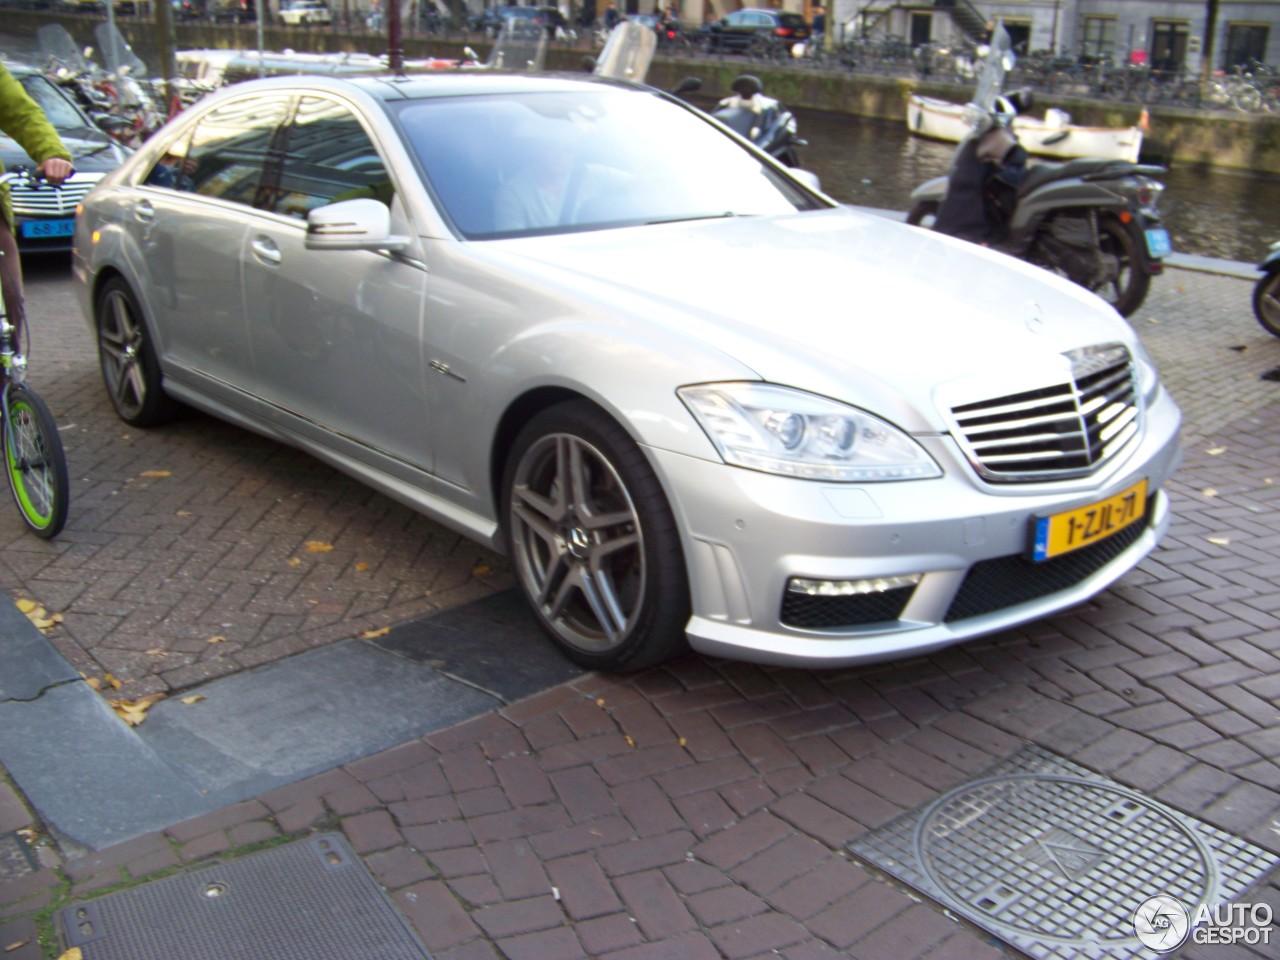 Mercedes benz s 63 amg w221 2010 1 november 2015 for Mercedes benz s63 amg 2010